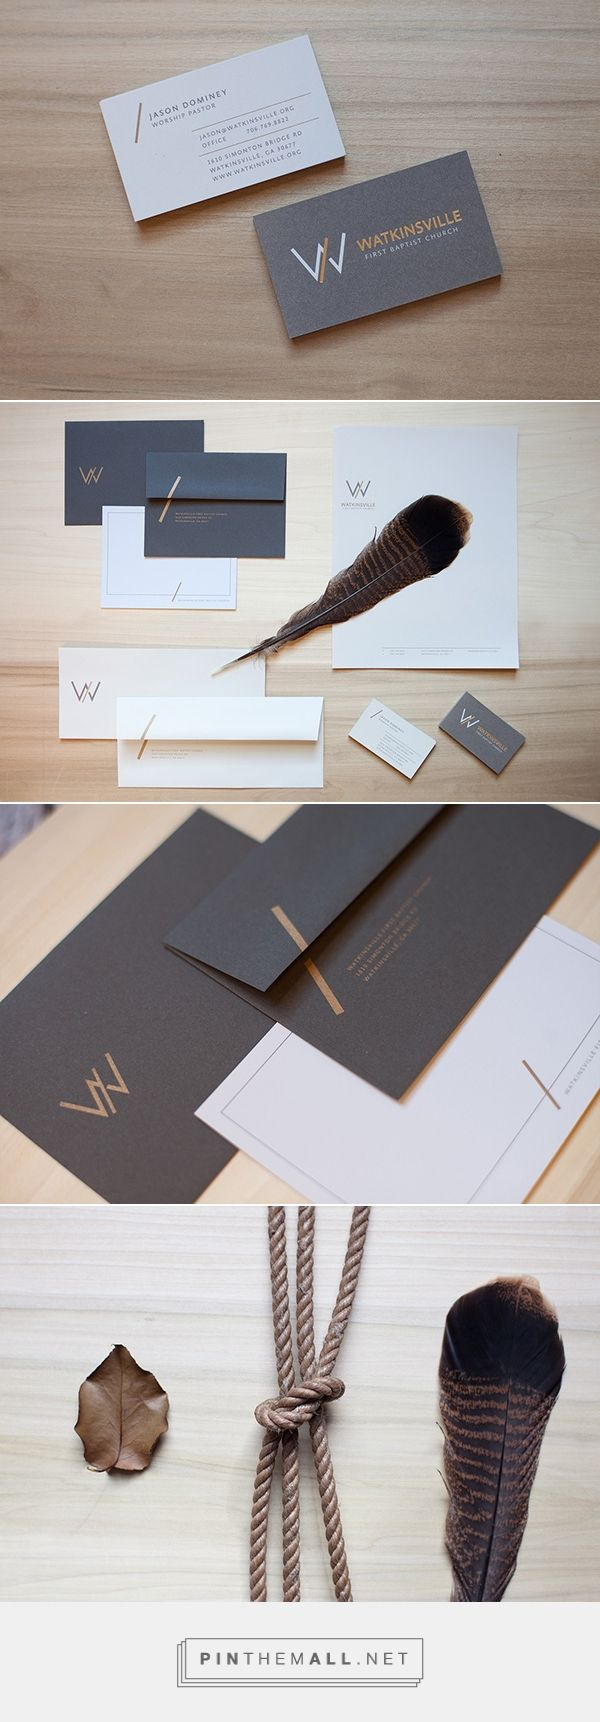 Watkinsville First Baptist Church Branding on Behance | Fivestar Branding – Design and Branding Agency & Inspiration Gallery